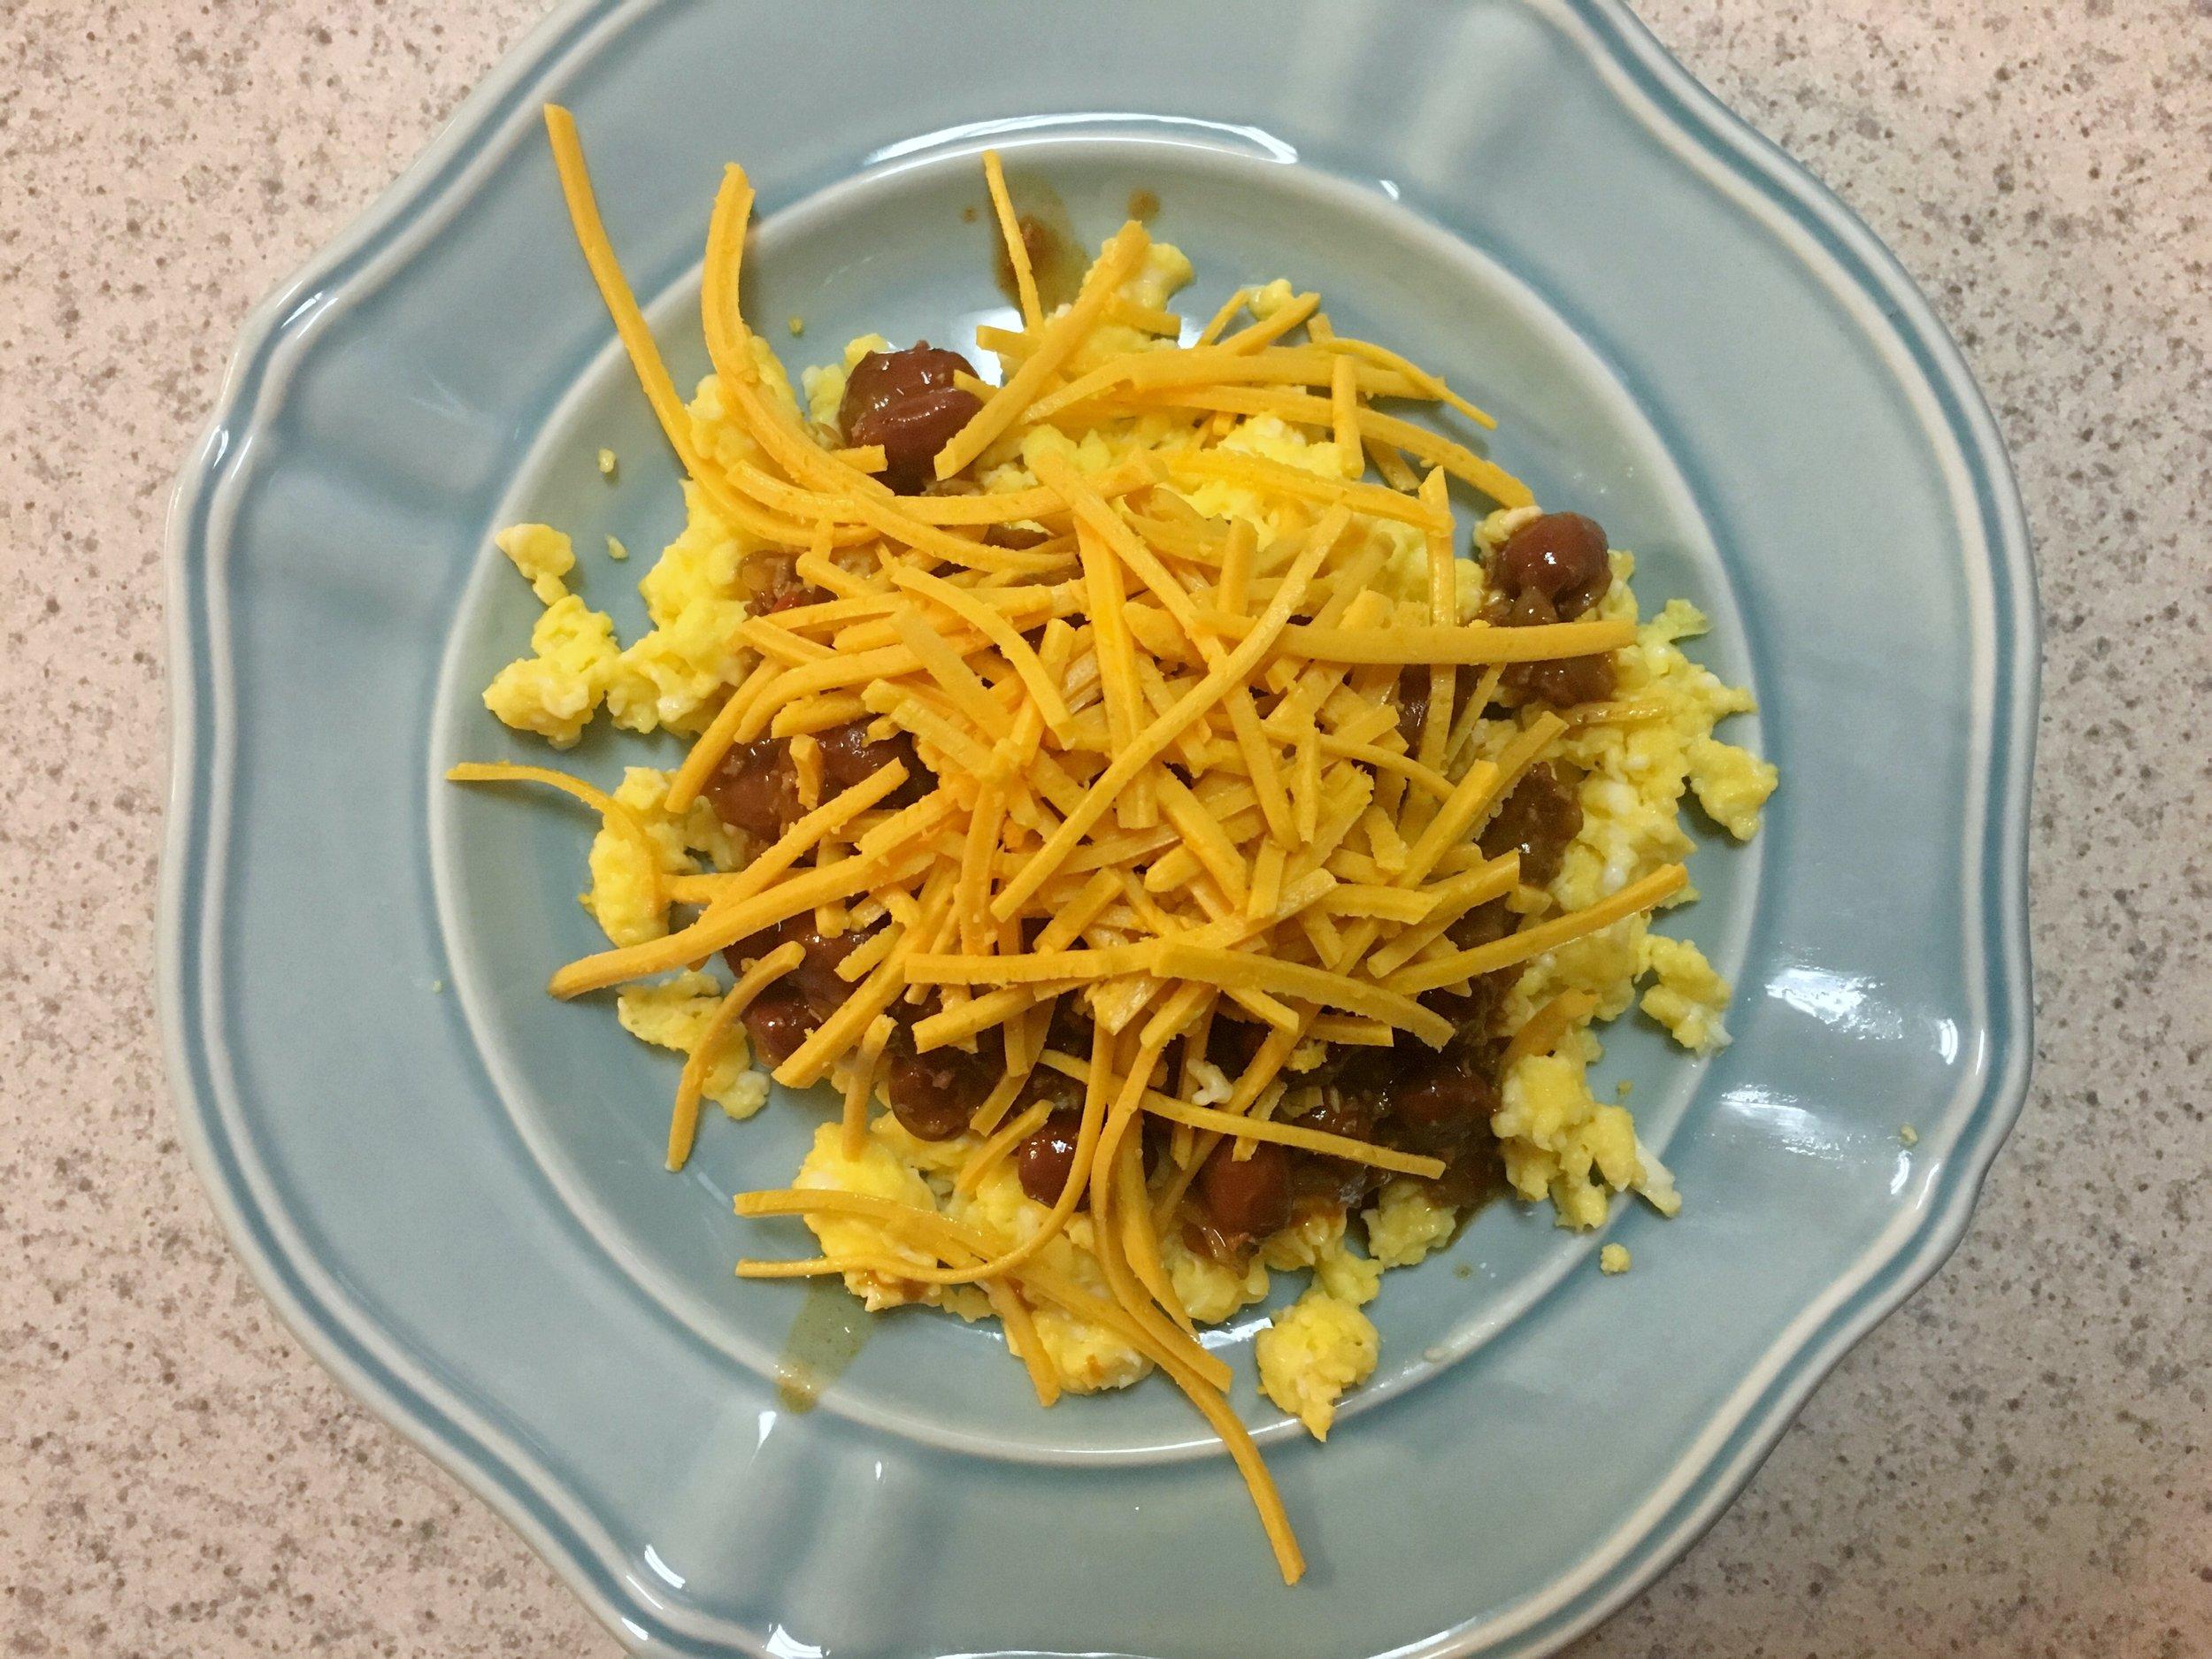 Scrambled eggs with chili